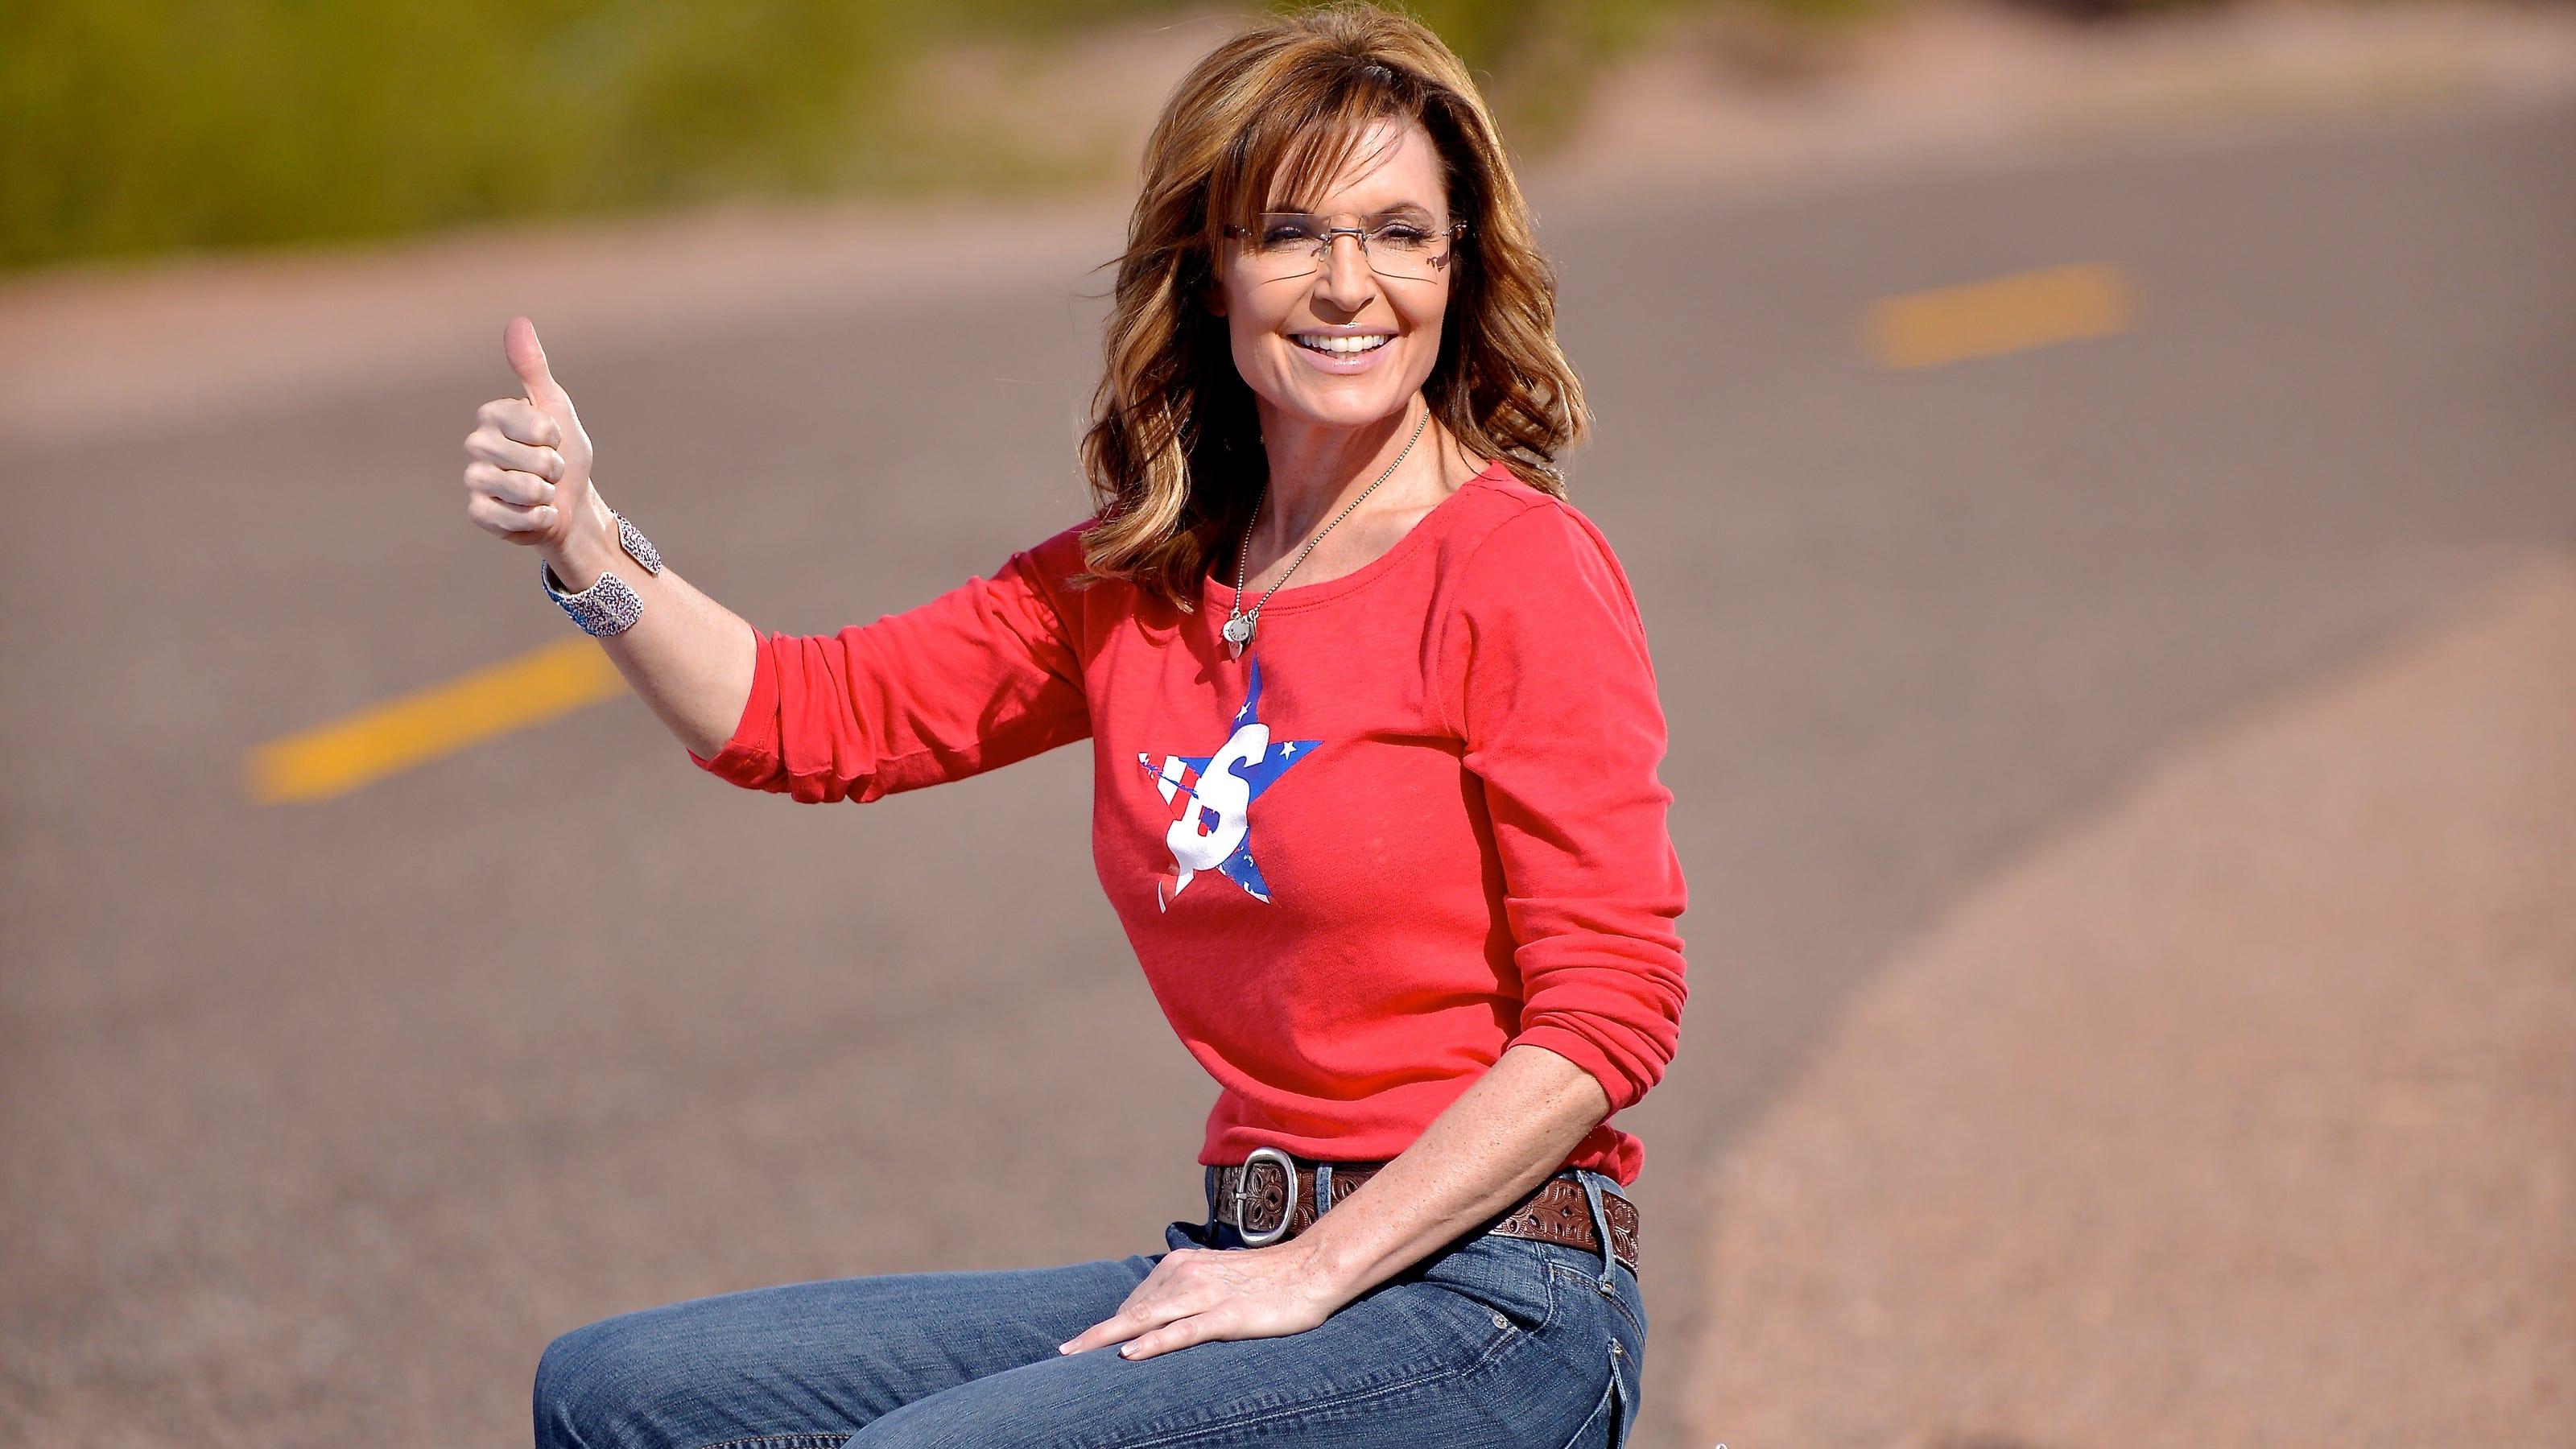 Exclusive: Wanna see Sarah Palin go hitchhiking?